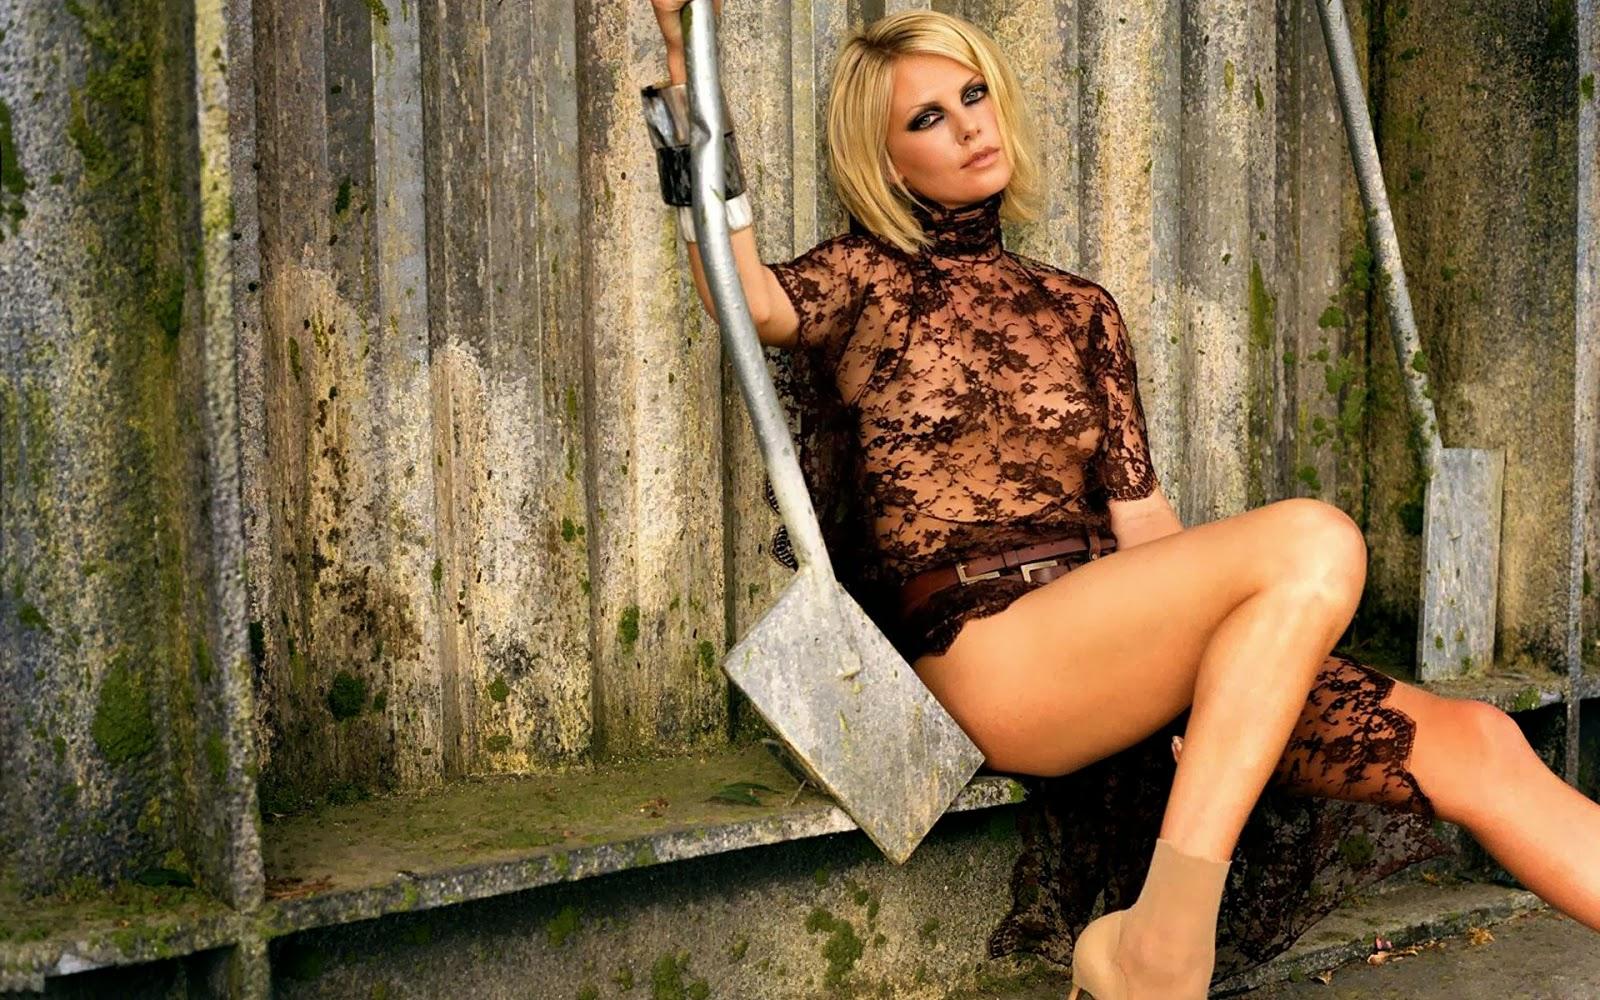 Charlize Theron sexy : Les photos torrides dune bombe